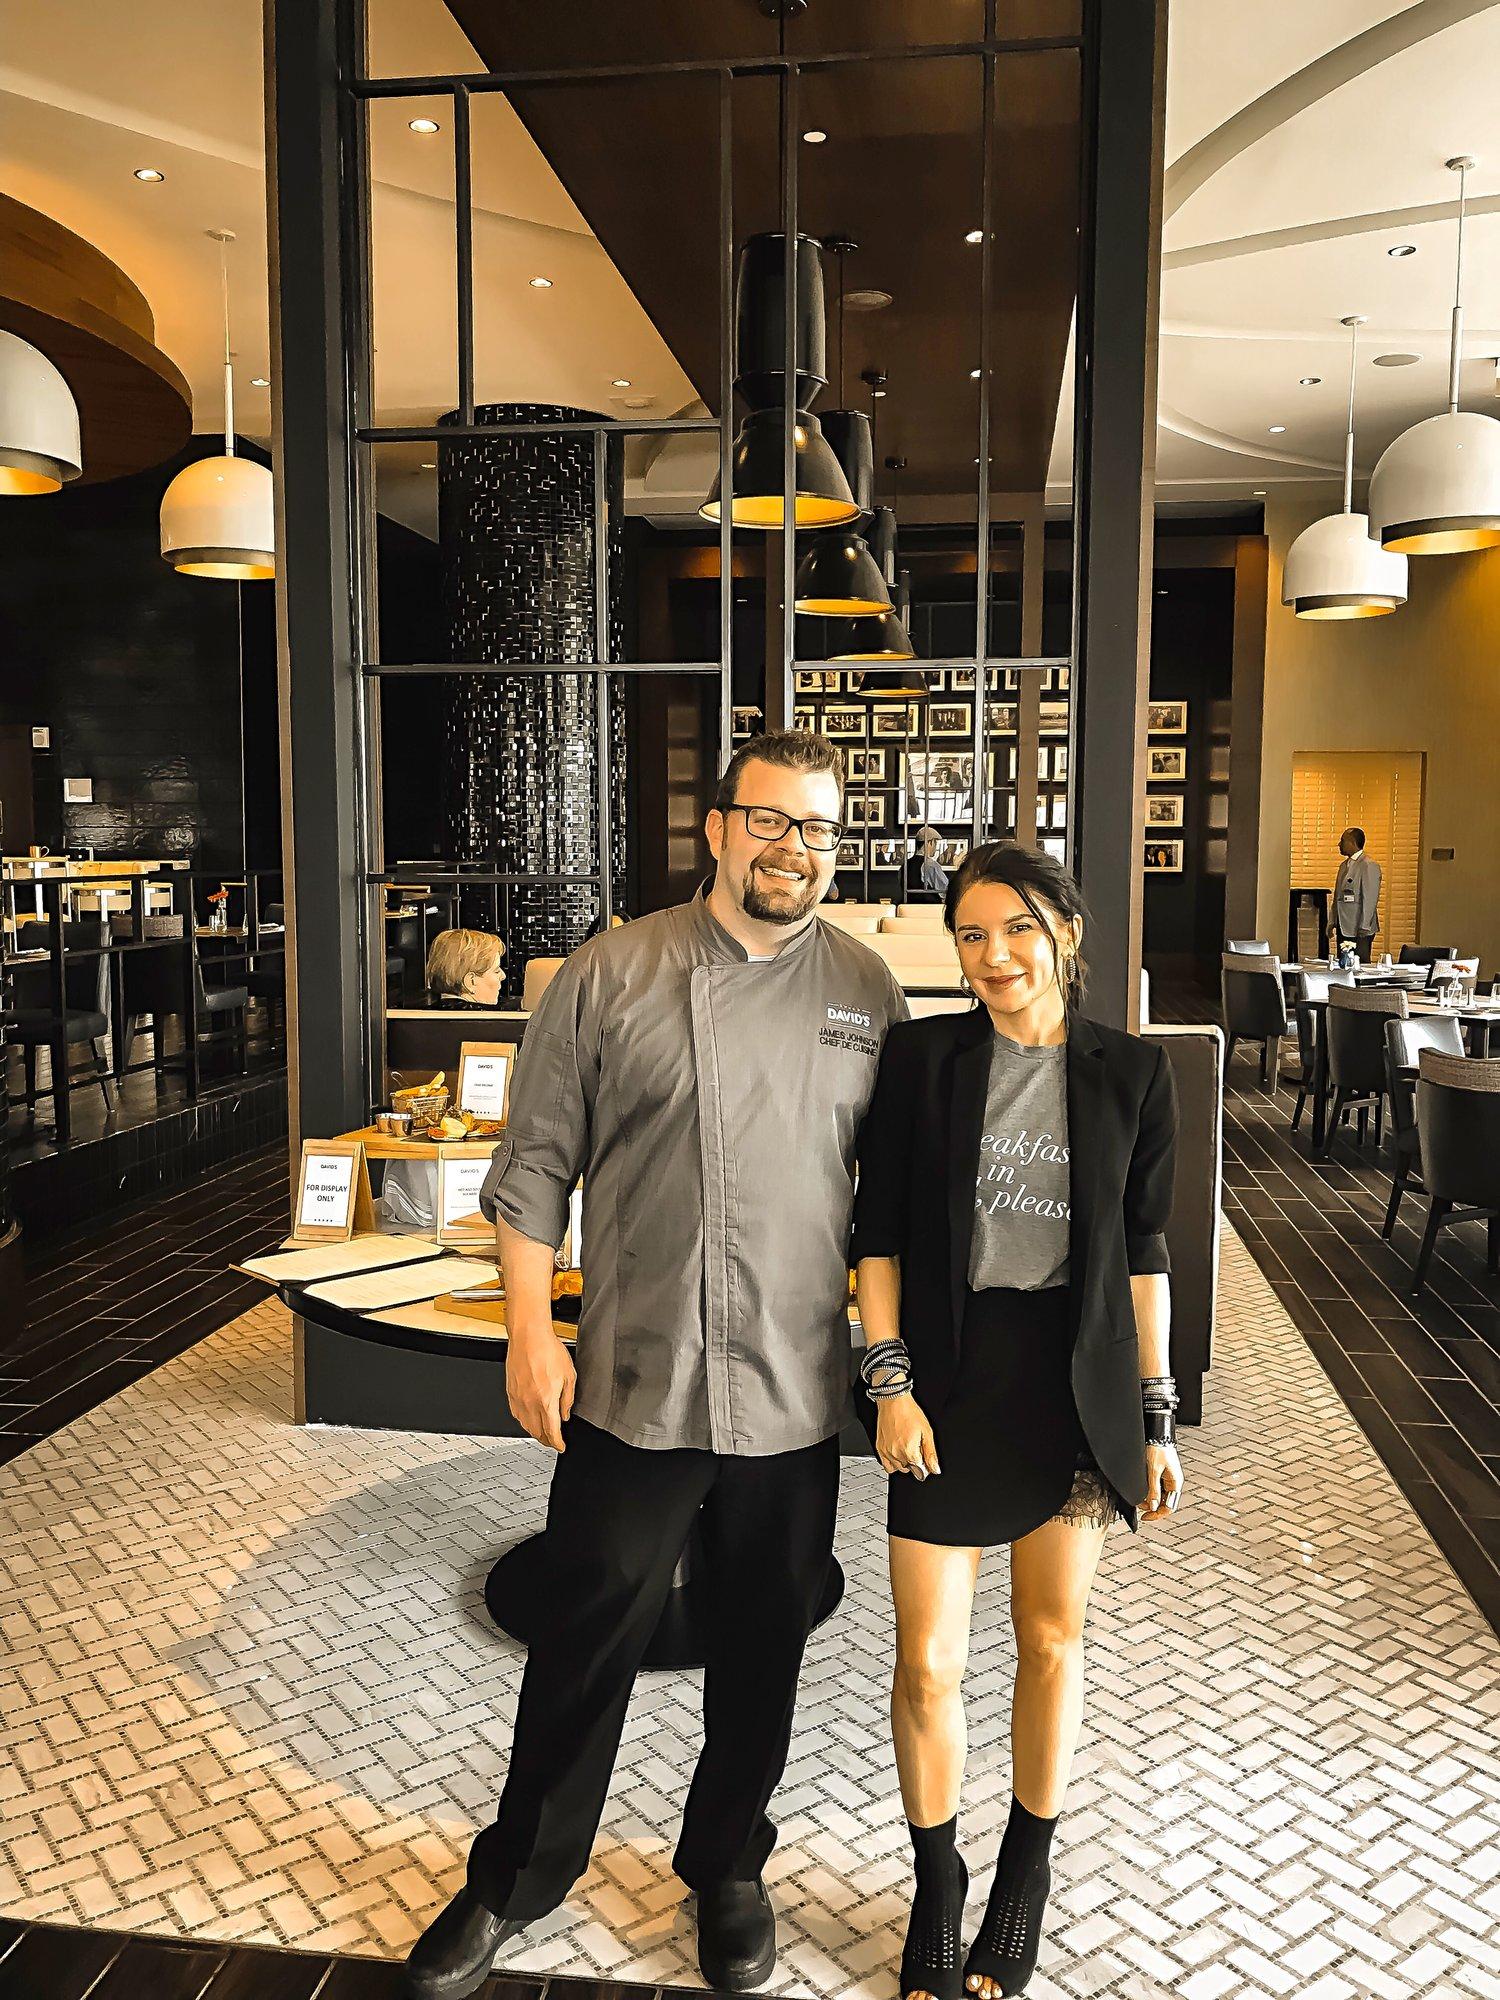 Live Hotel Casino David Chef Isabel Alexander Posing After Tasting Menu